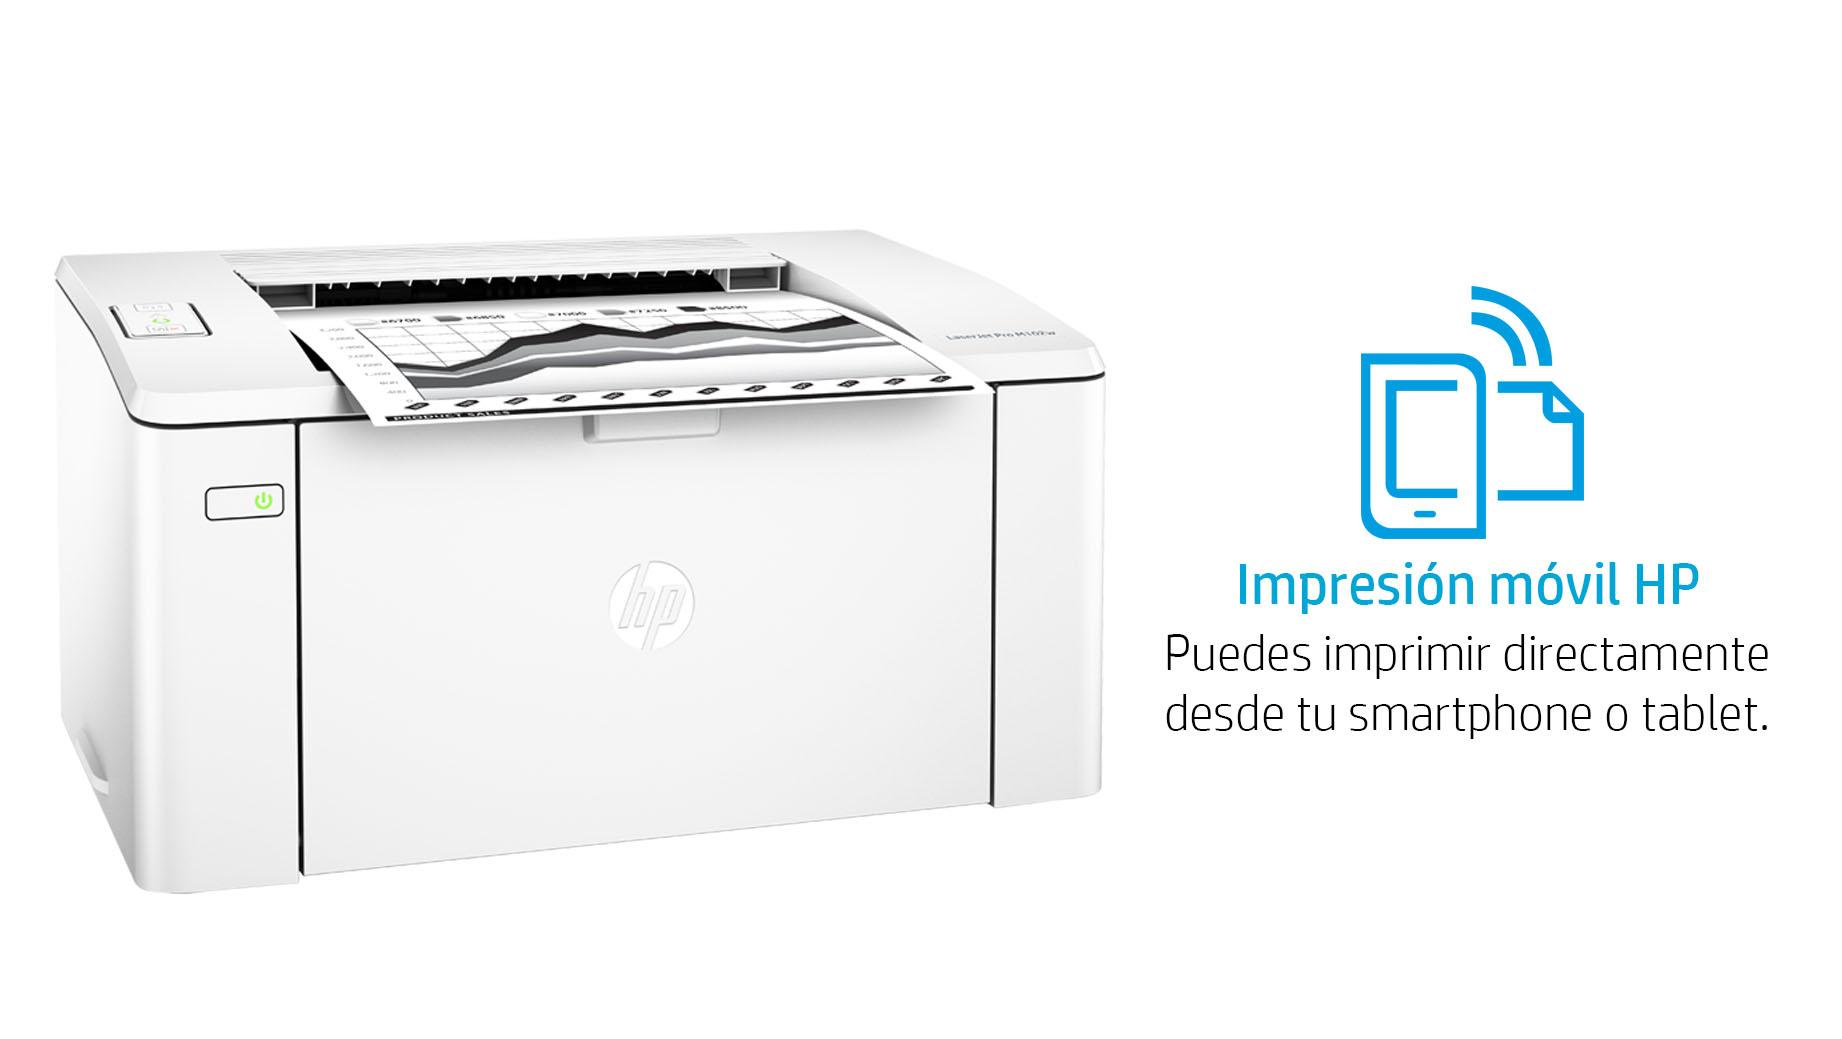 hp laser printer laserjet pro m102w wireless  amazon com mx  electr u00f3nicos